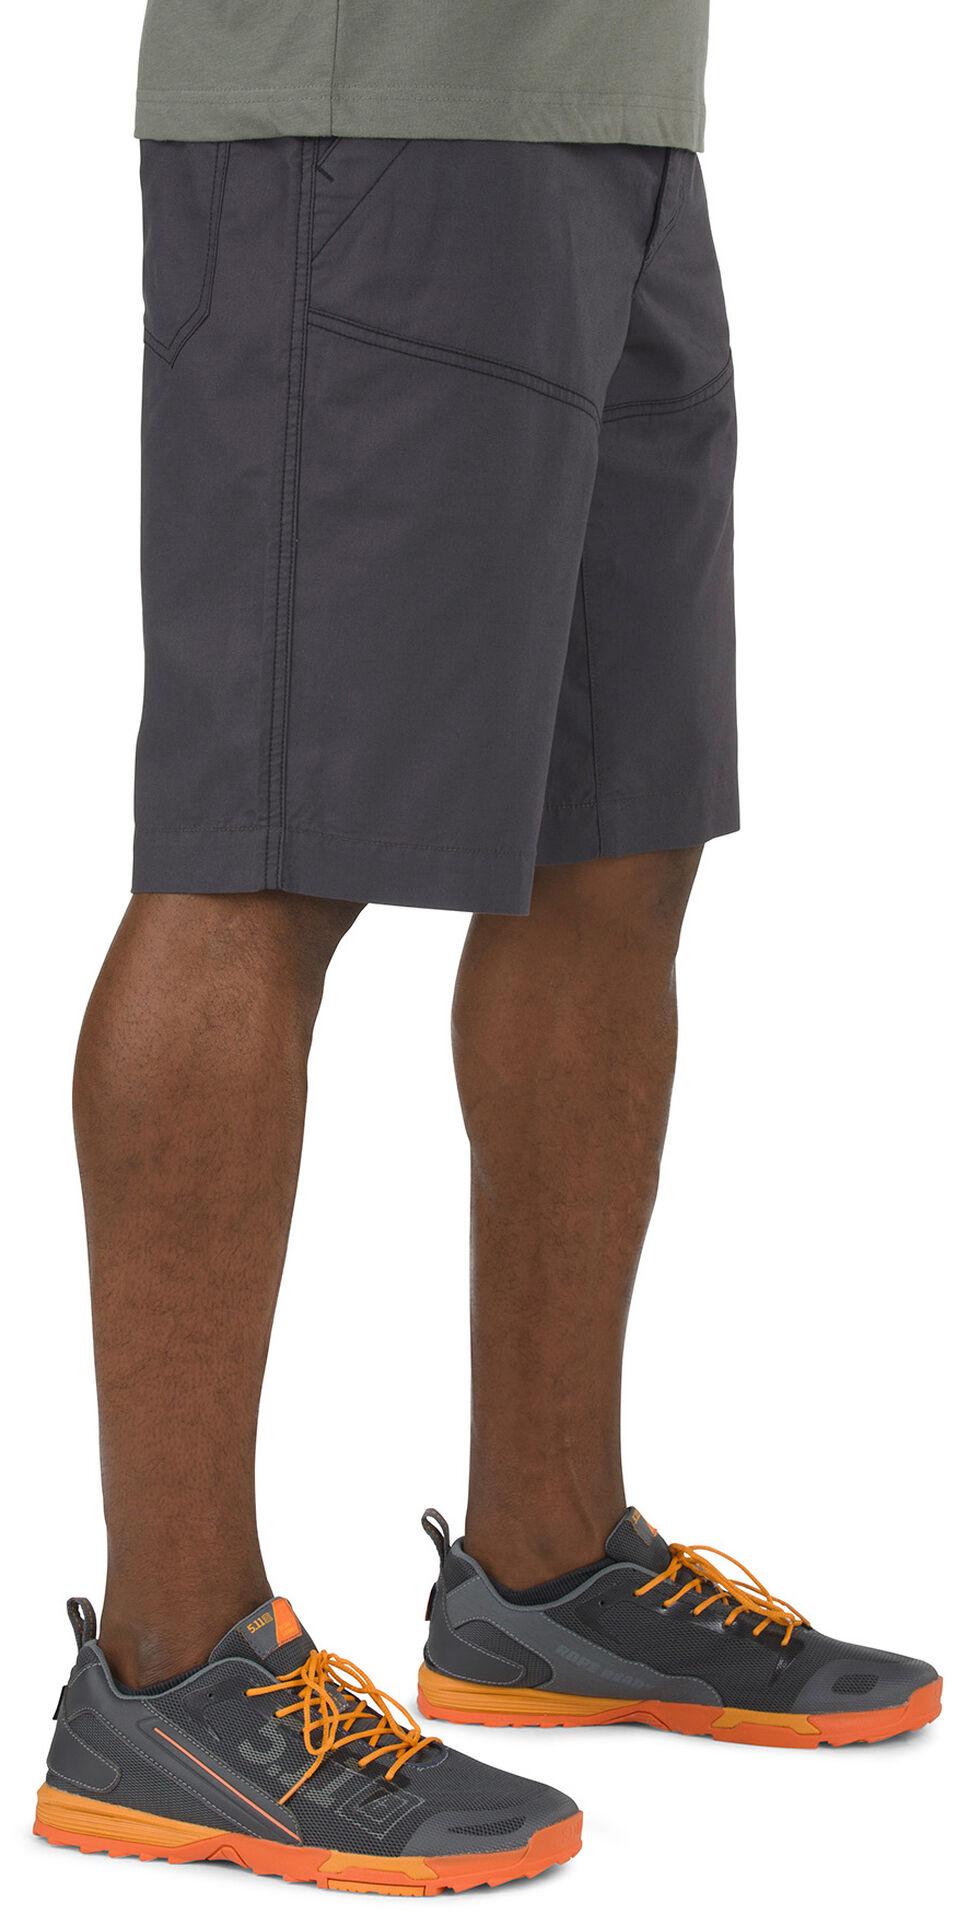 5.11 Tactical Switchback Shorts, Charcoal Grey, hi-res